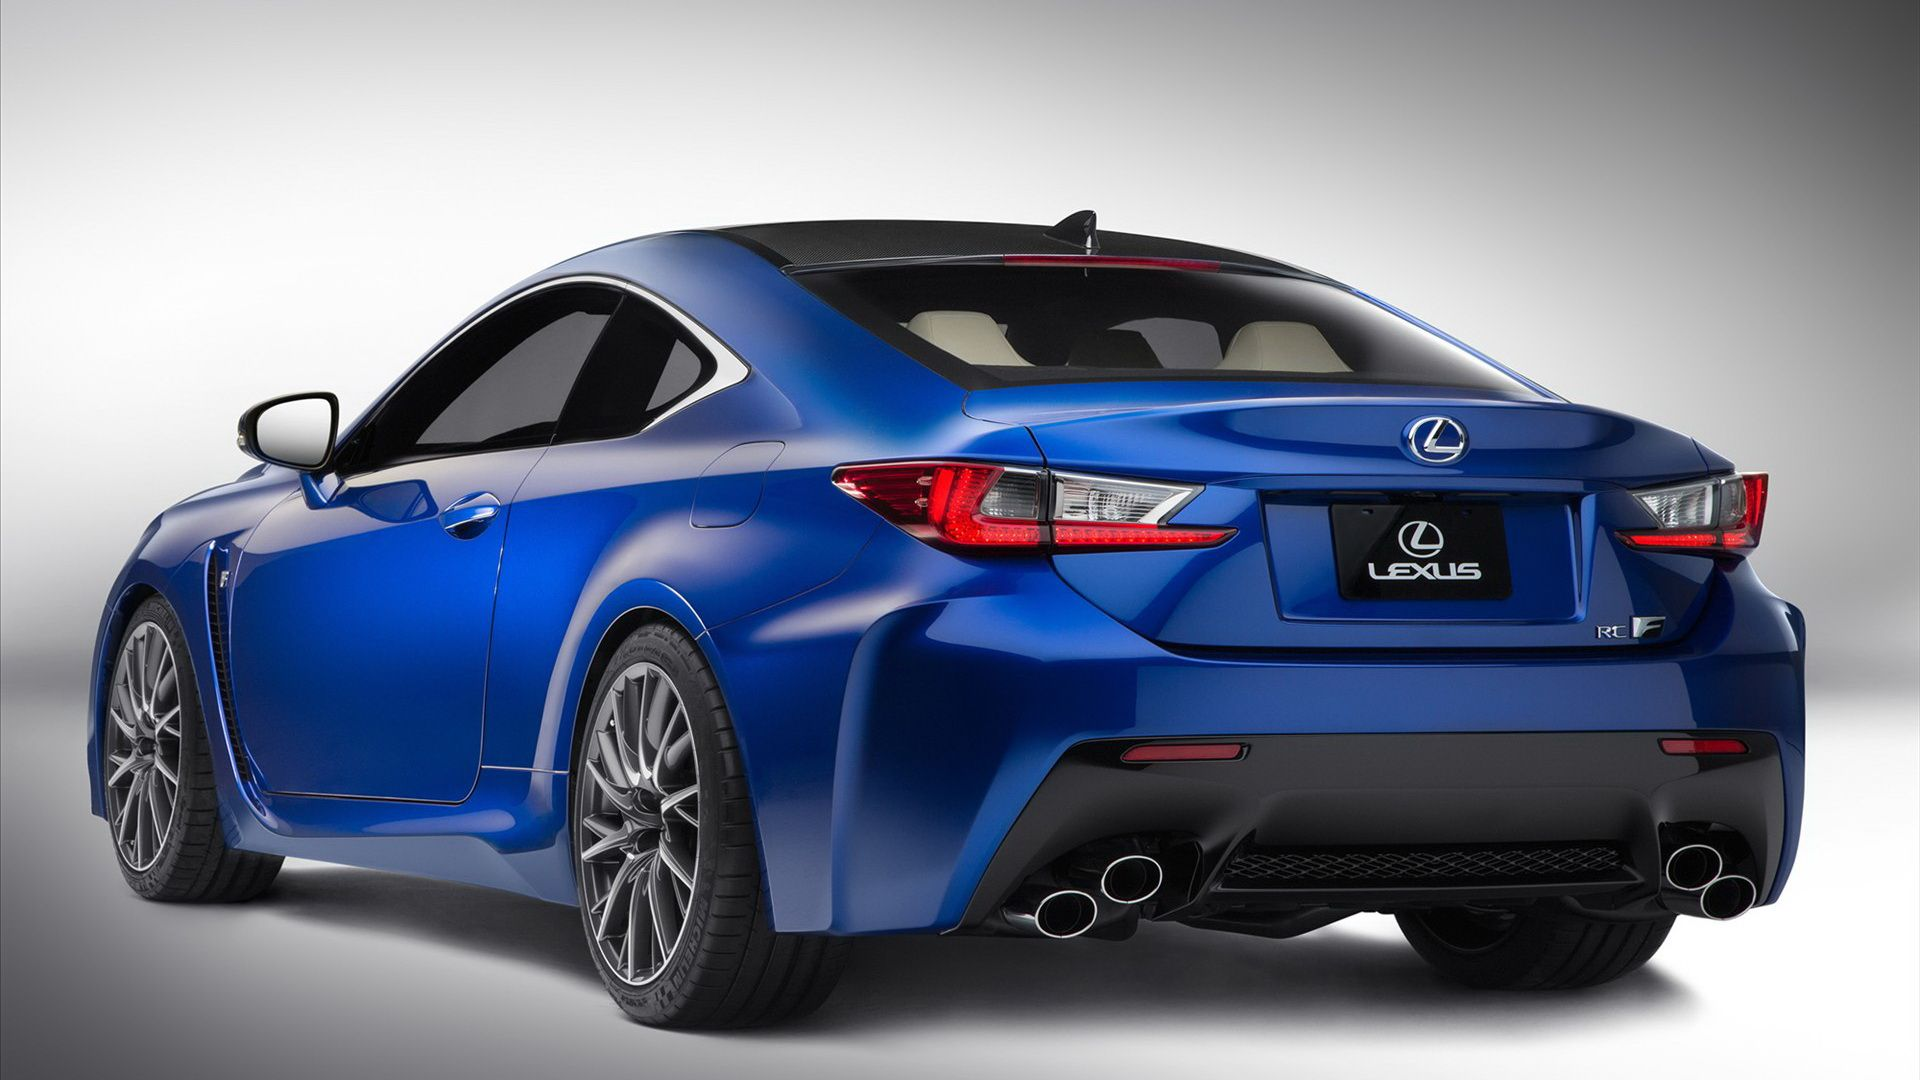 lexus sports car models 2015 sports cars2015 Lexus RC F